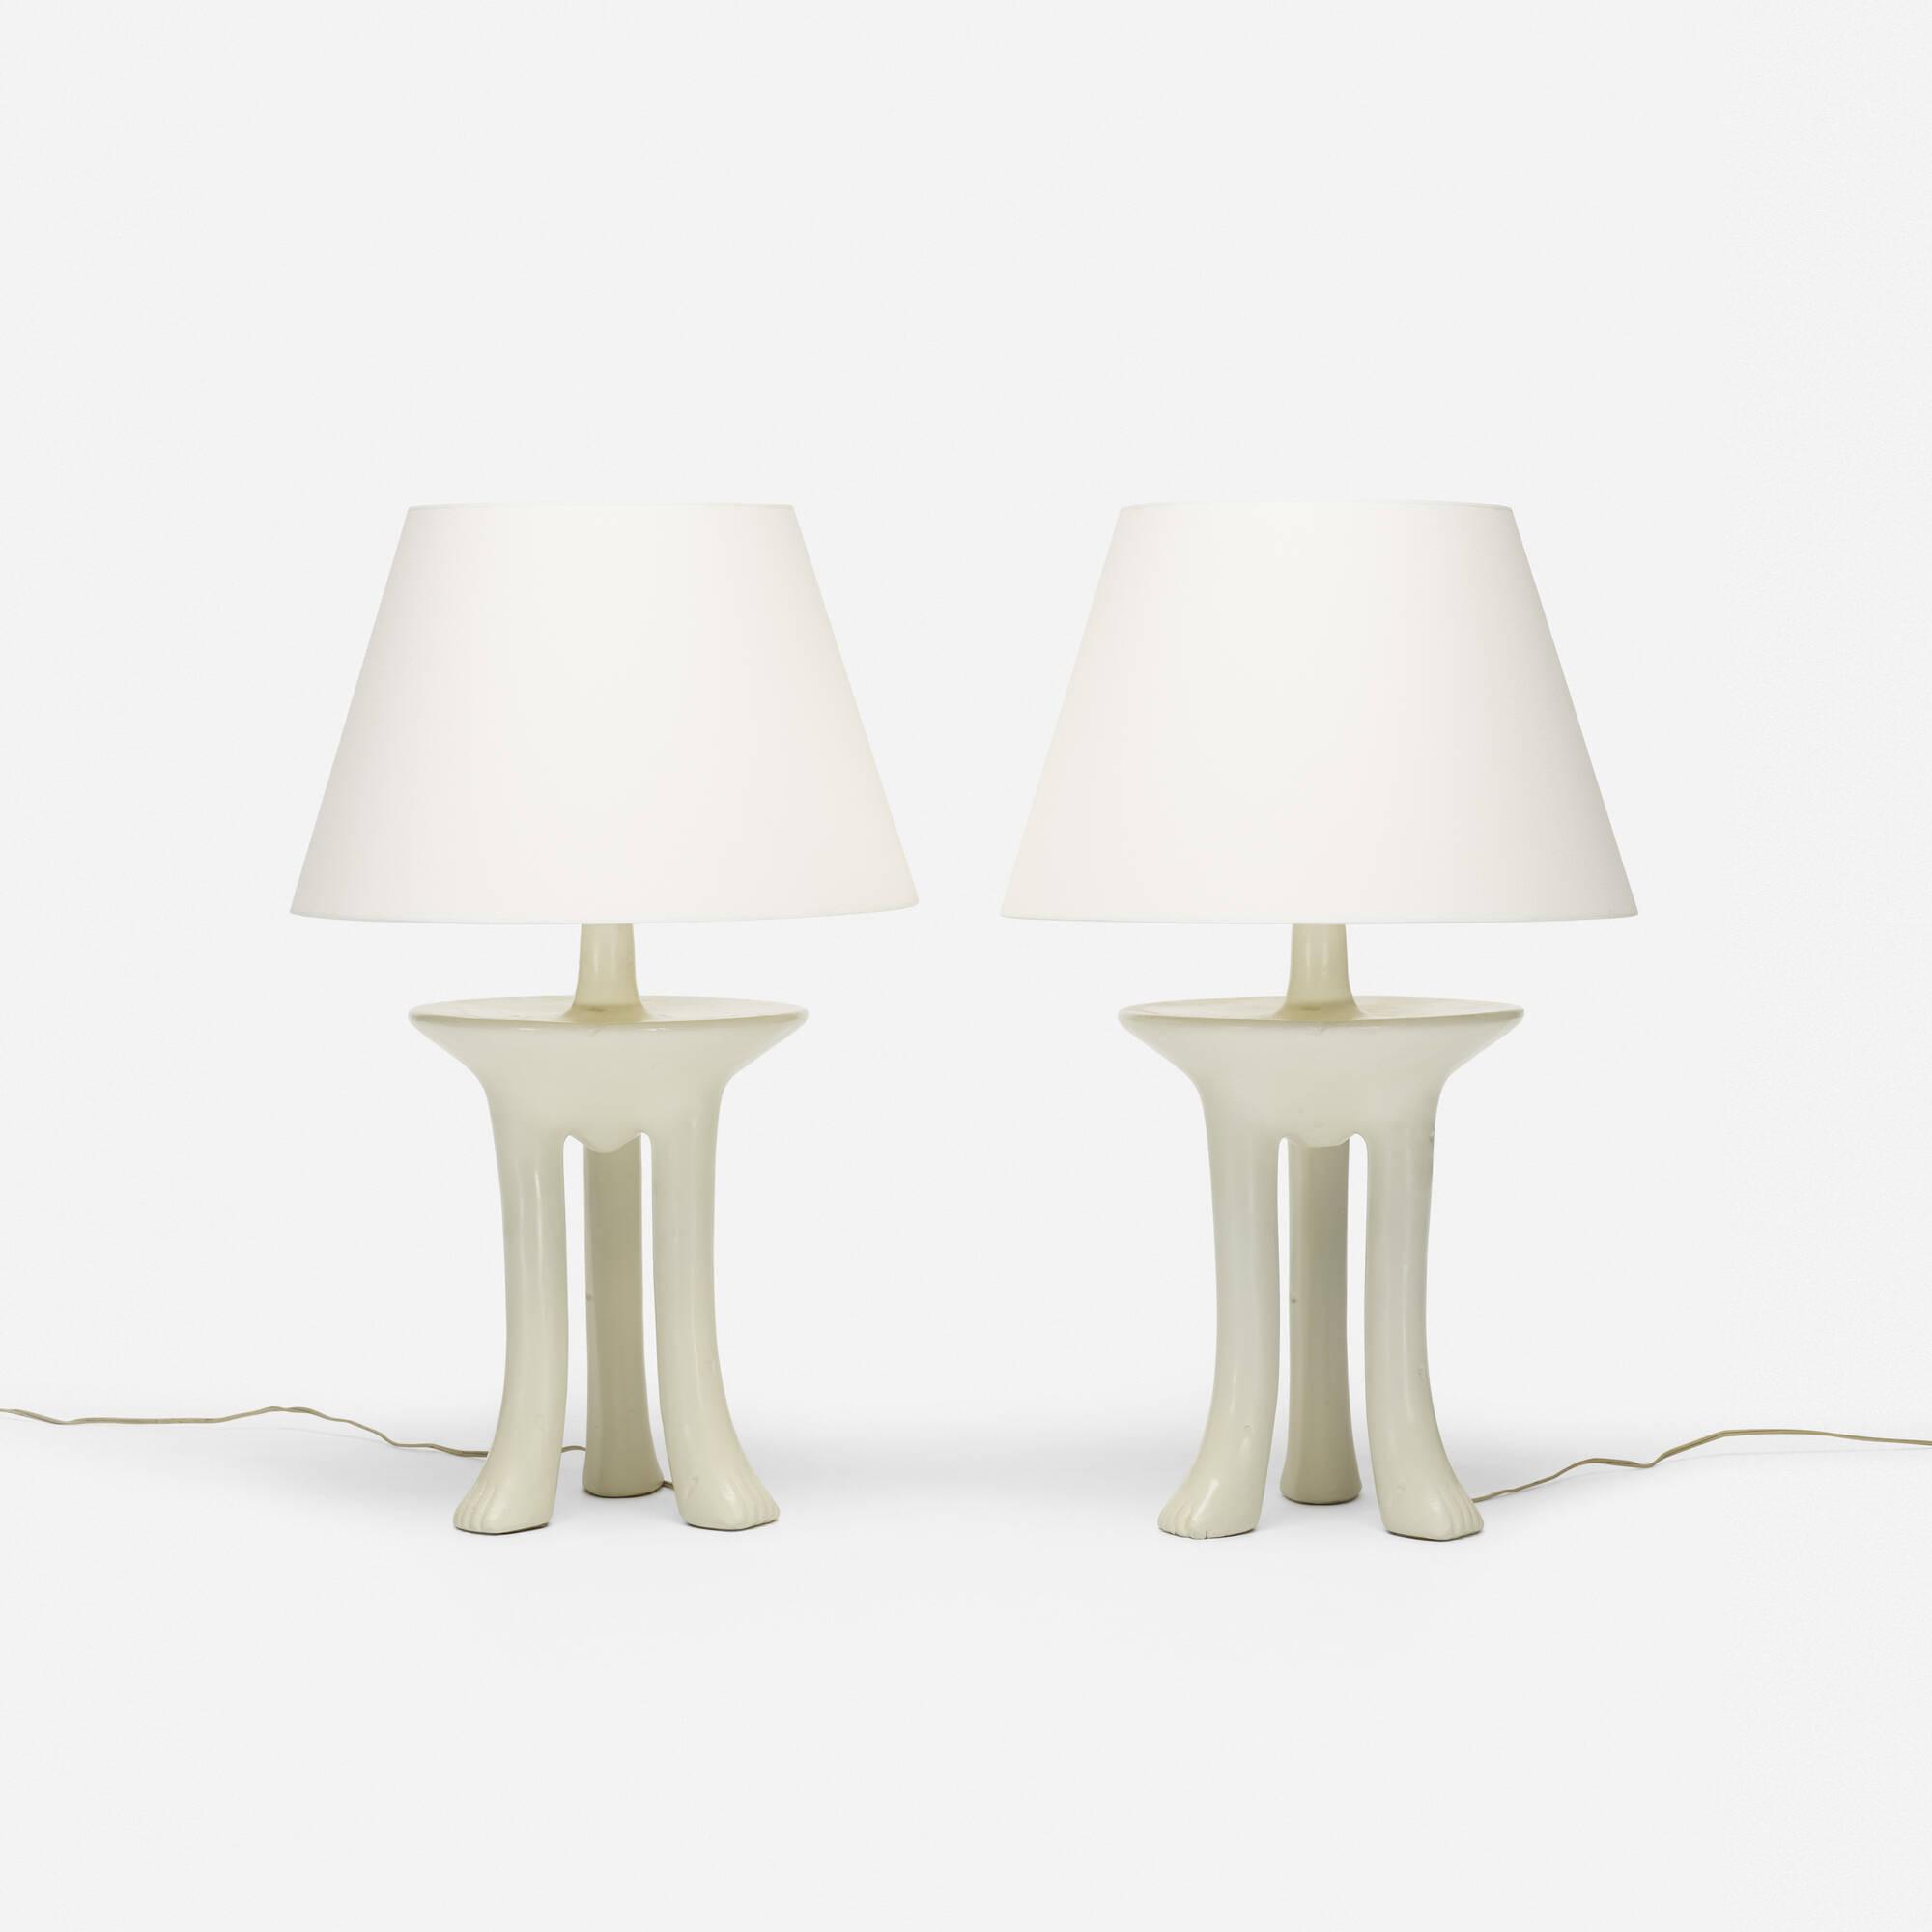 376: John Dickinson / African table lamps, pair (1 of 3)